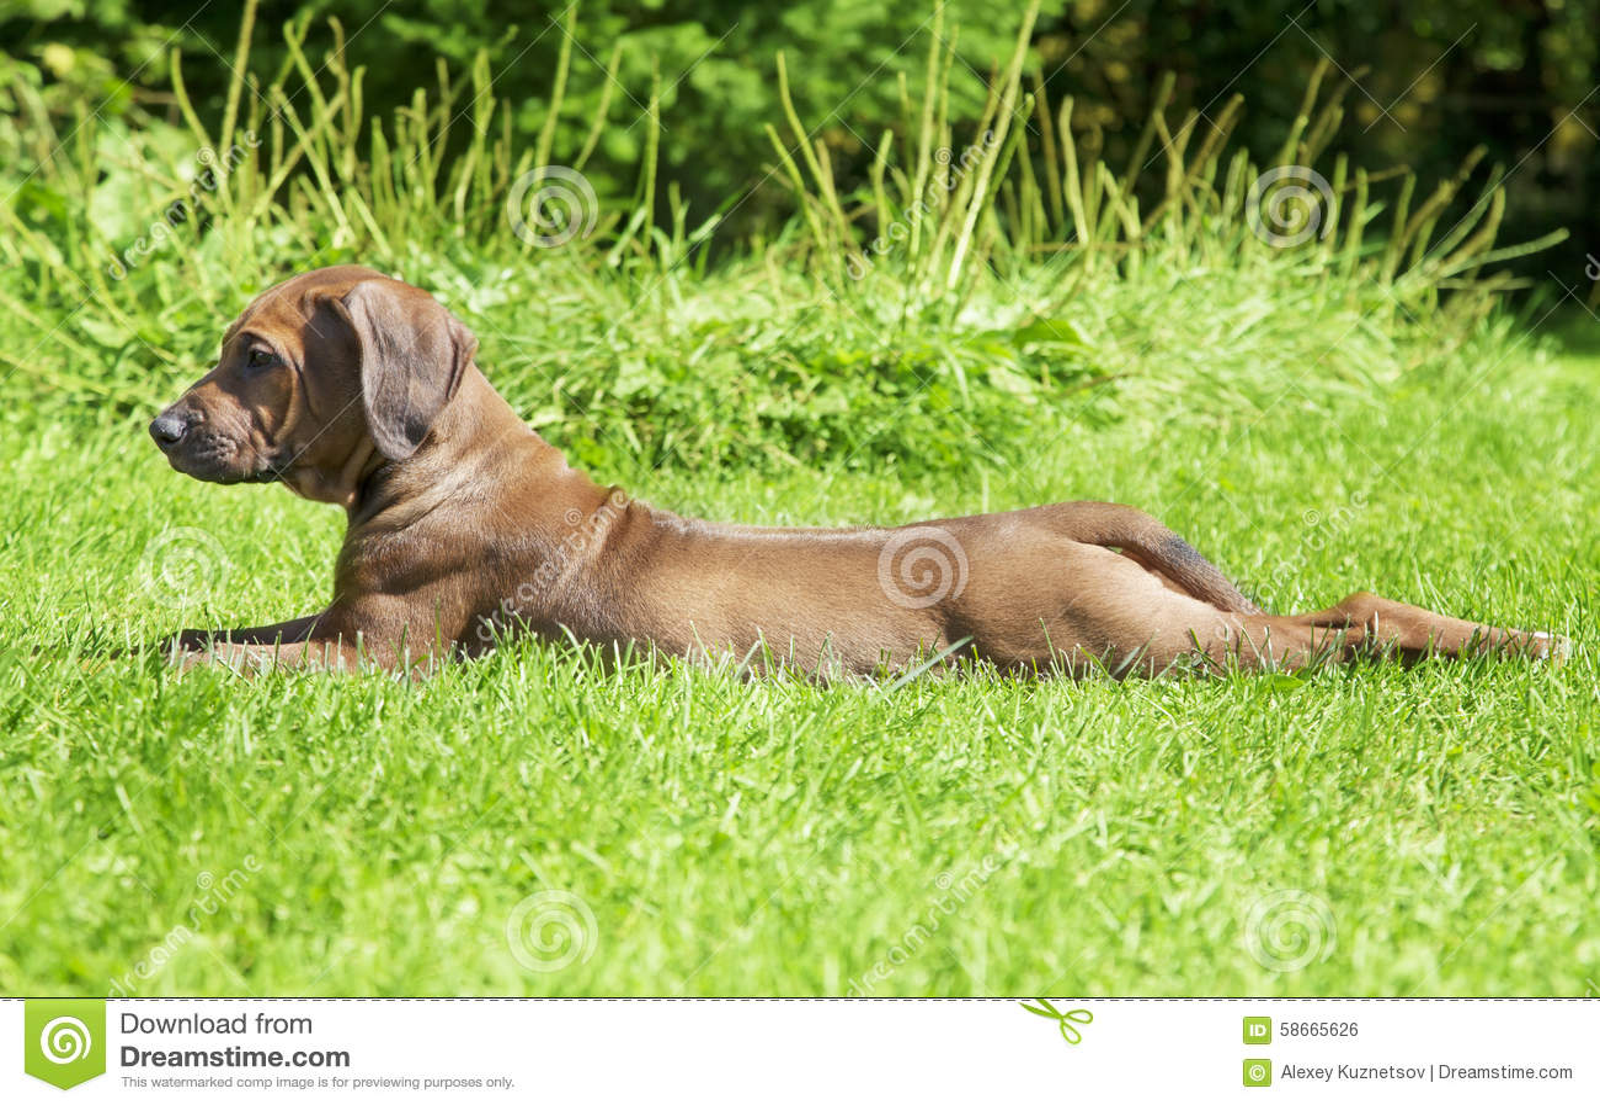 Rhodesian Ridgeback puppy dog outdoors